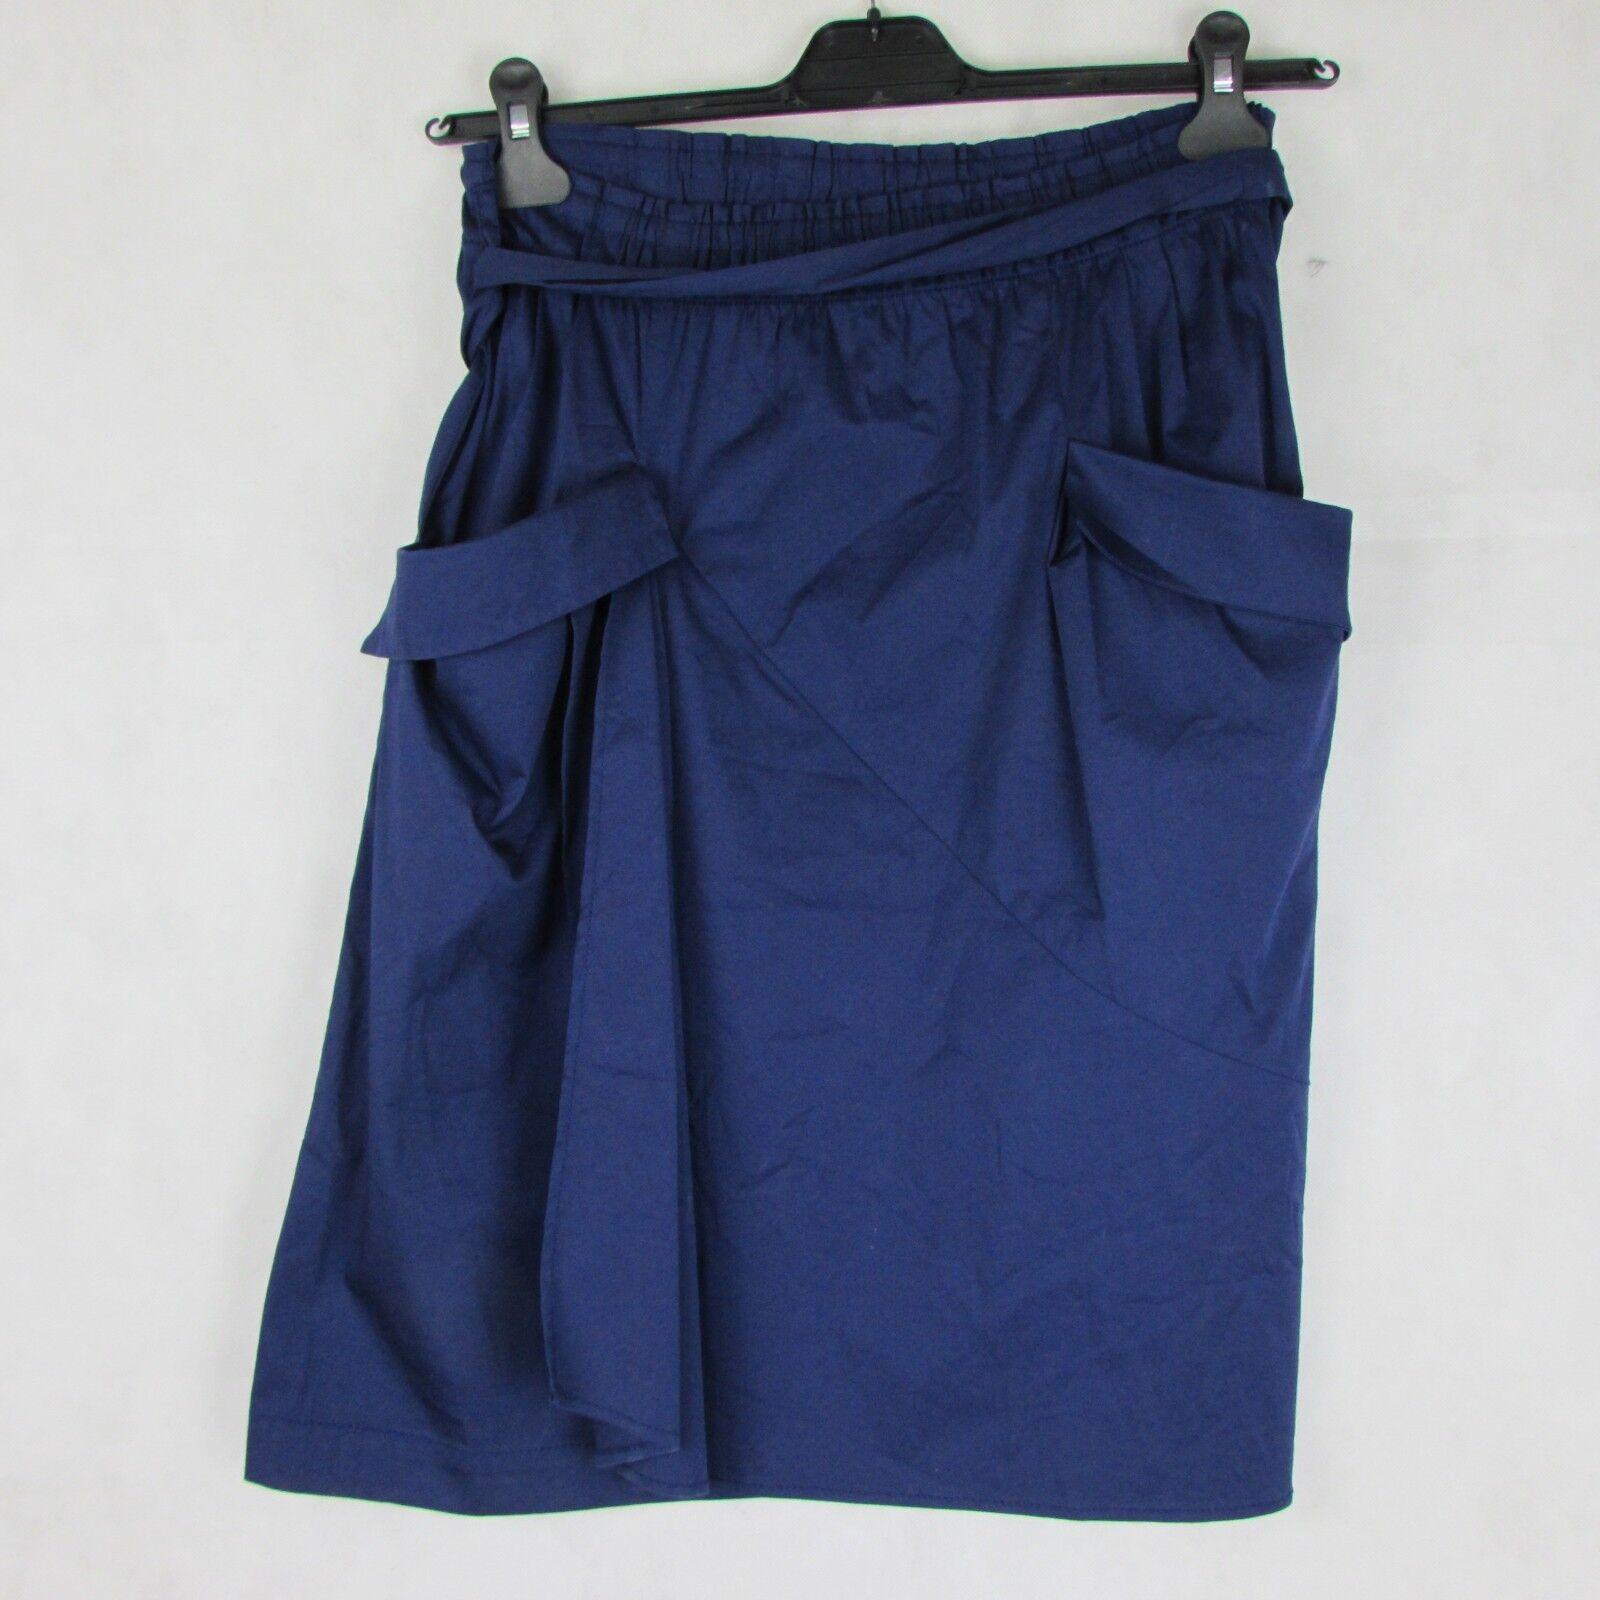 PHILOSOPHI DI ALBERTA FERRETTI 100% COTTON SIZE US 10 L NAVY blueE skirt A LINE